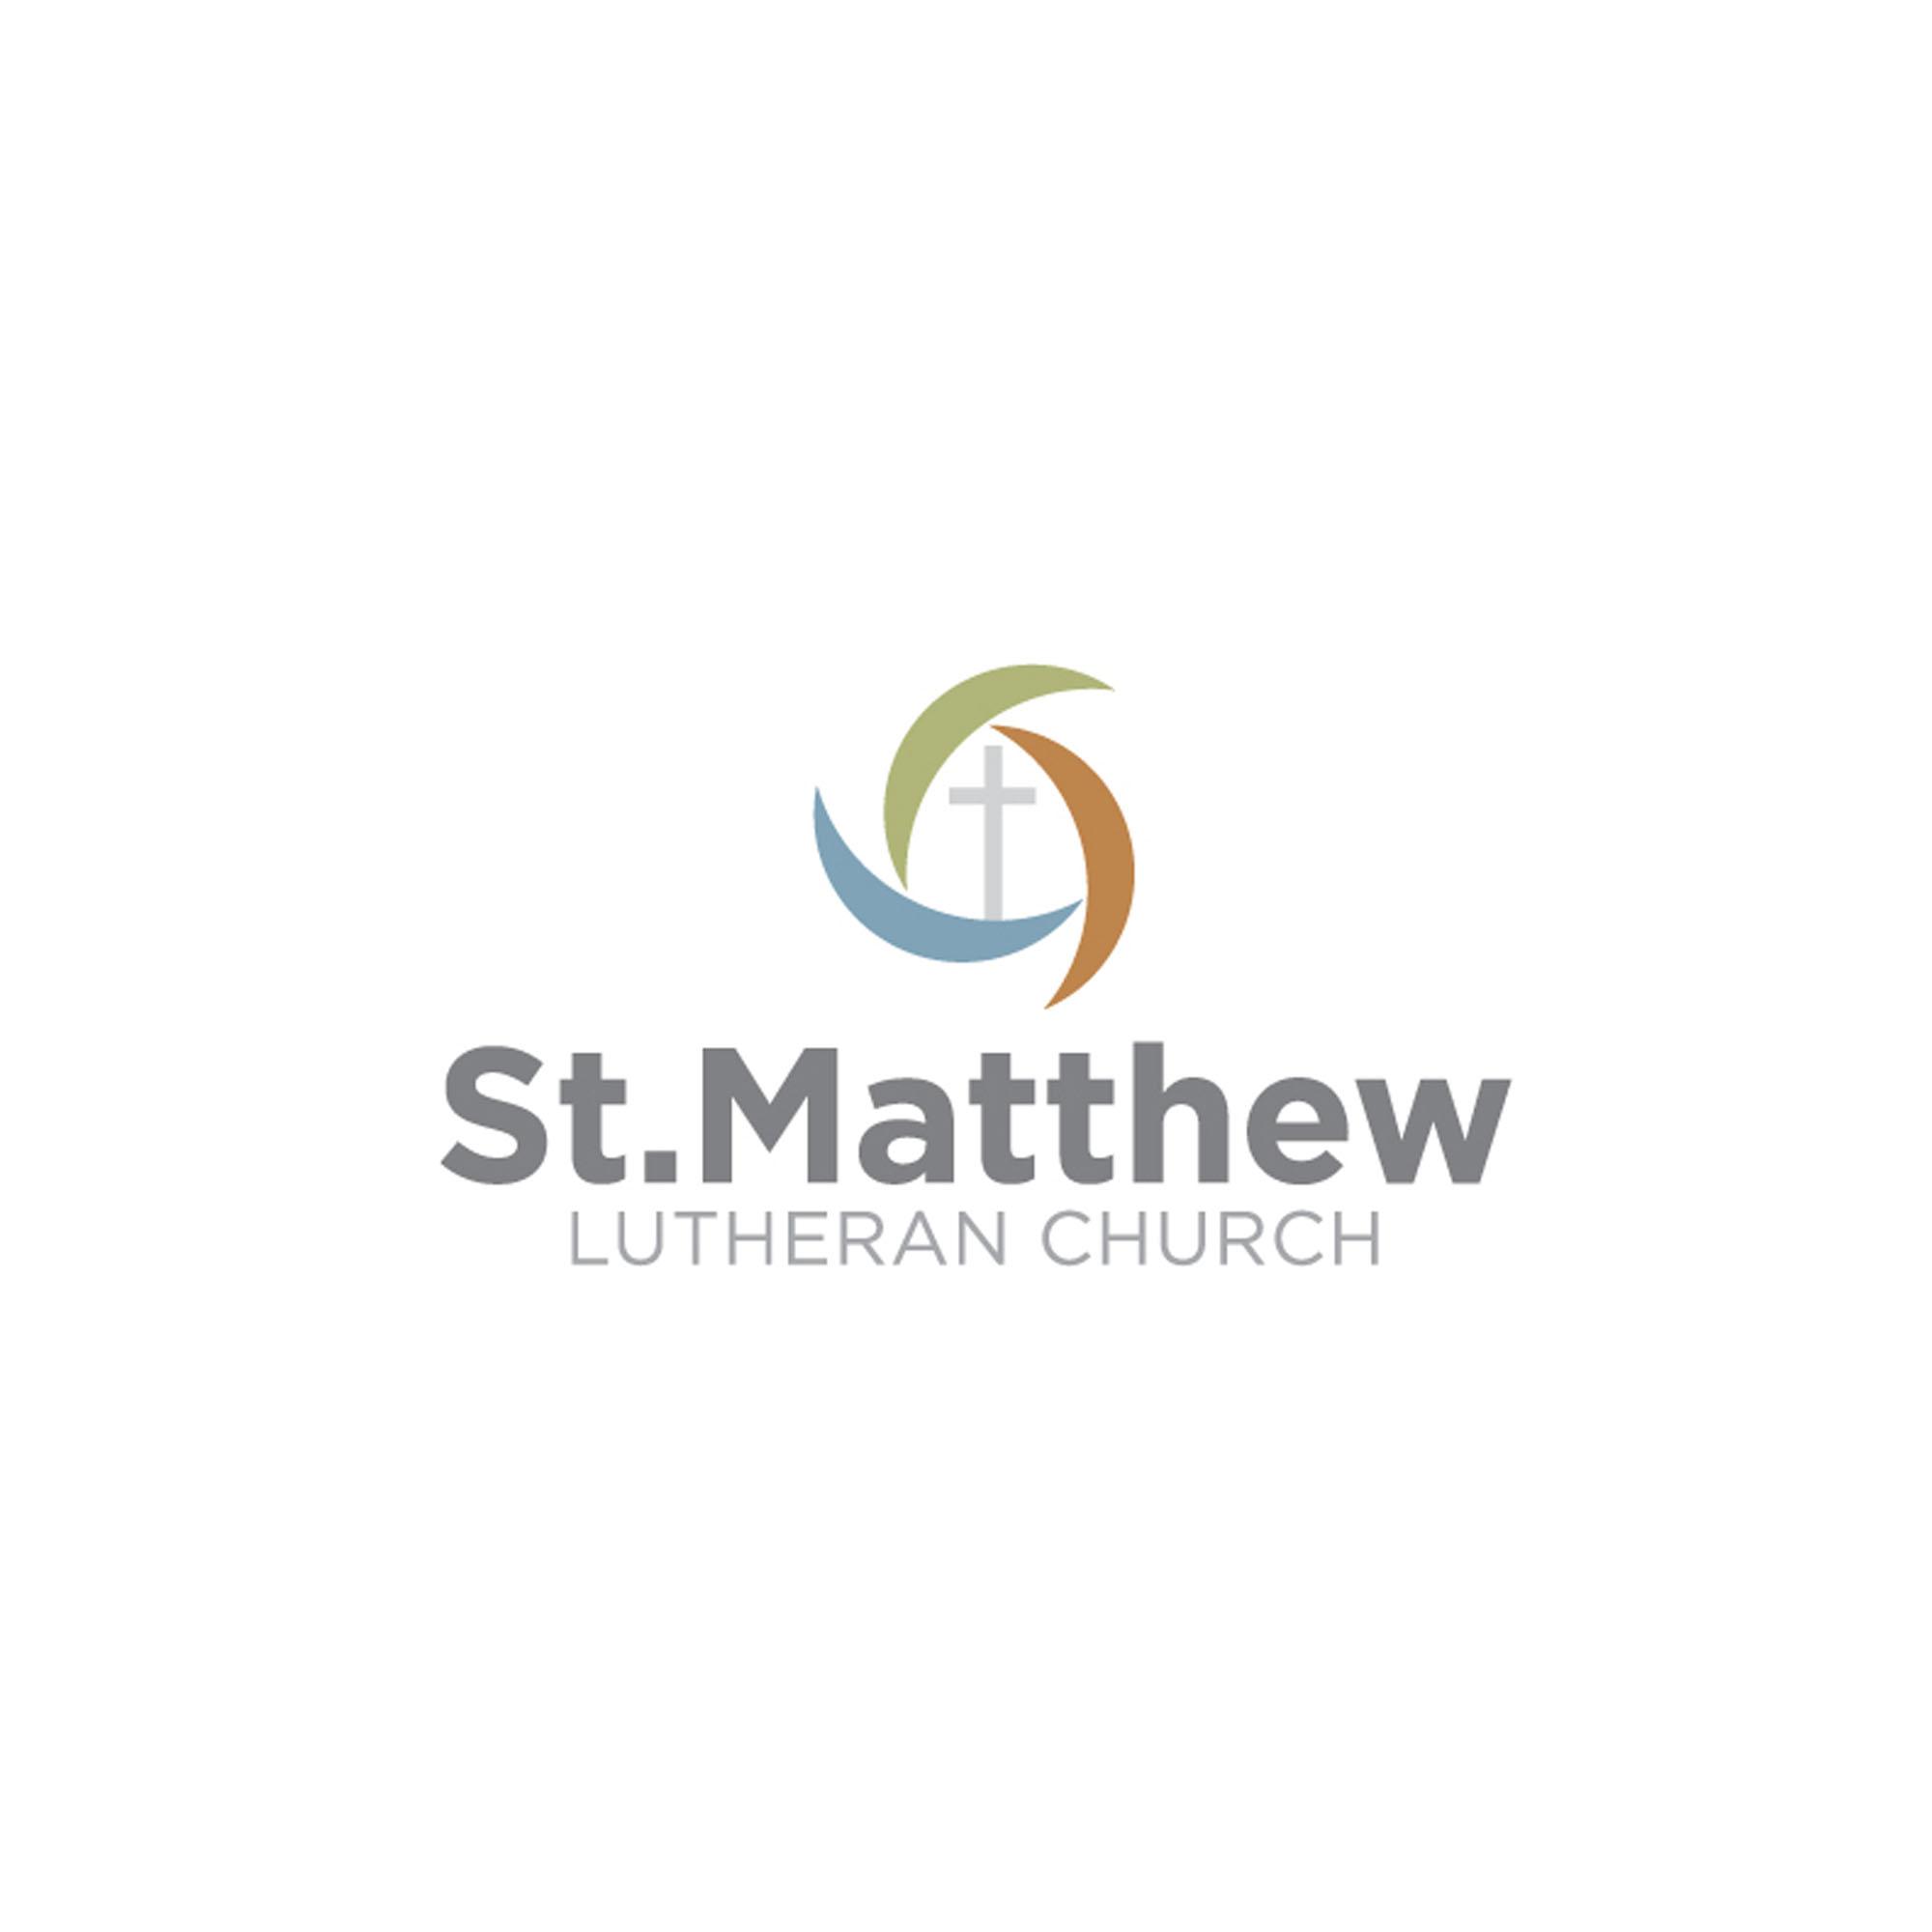 St. Matthew Lutheran Church- Rocklin, California